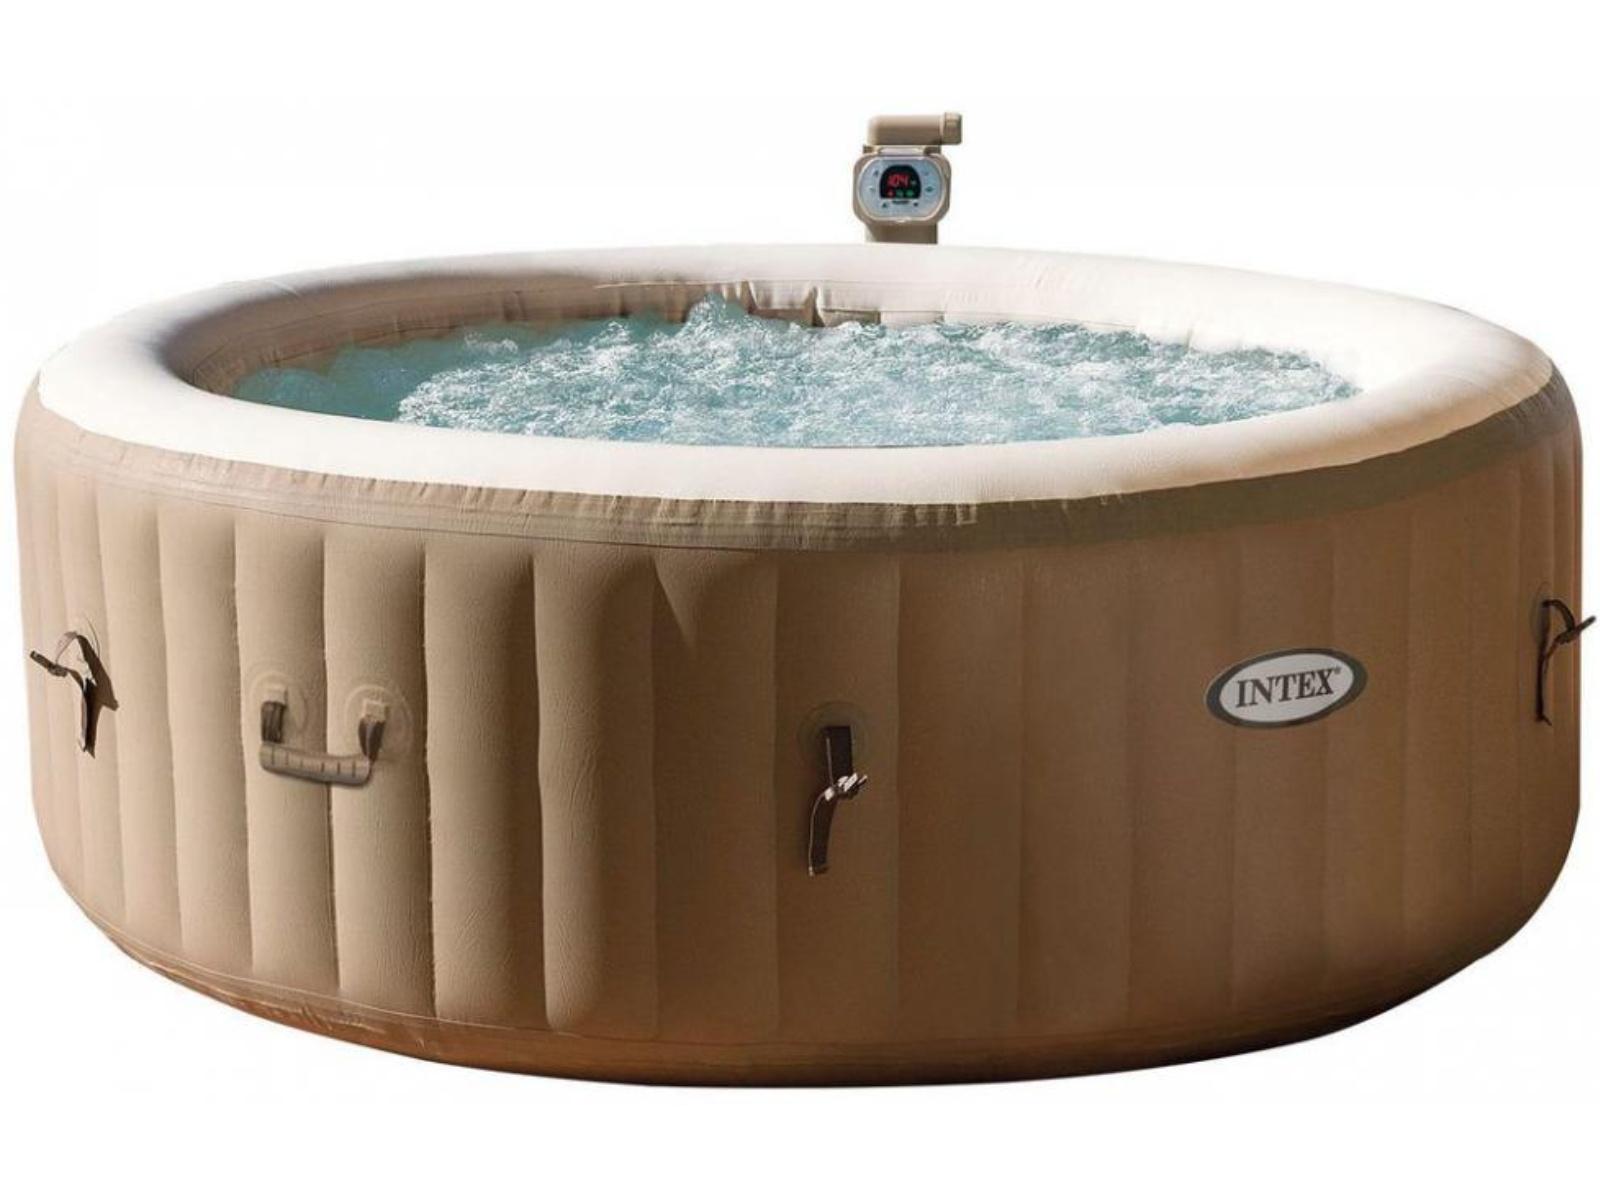 Vírivý bazén INTEX Pure Spa Bubbles